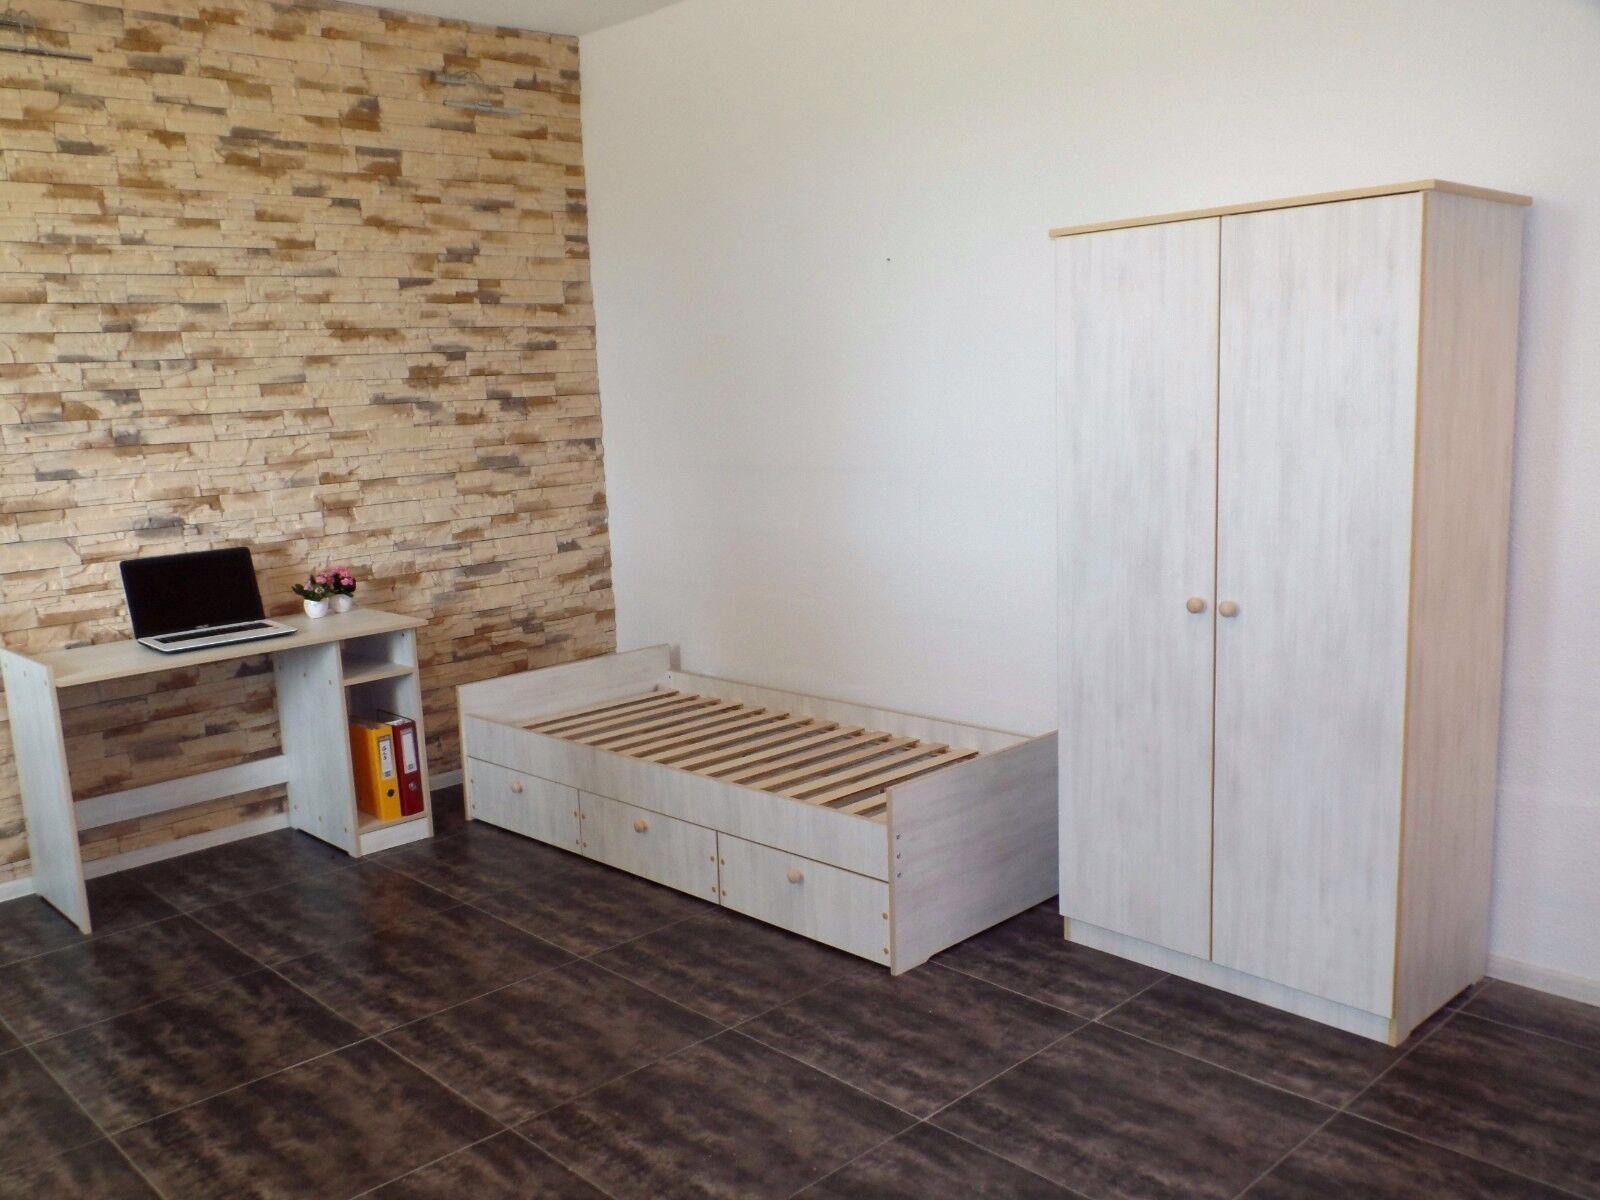 Funktionsbett 90x200 grau  Jugendbett 90x200 Funktionsbett Einzelbett Kojenbett WEIß-GRAU ...